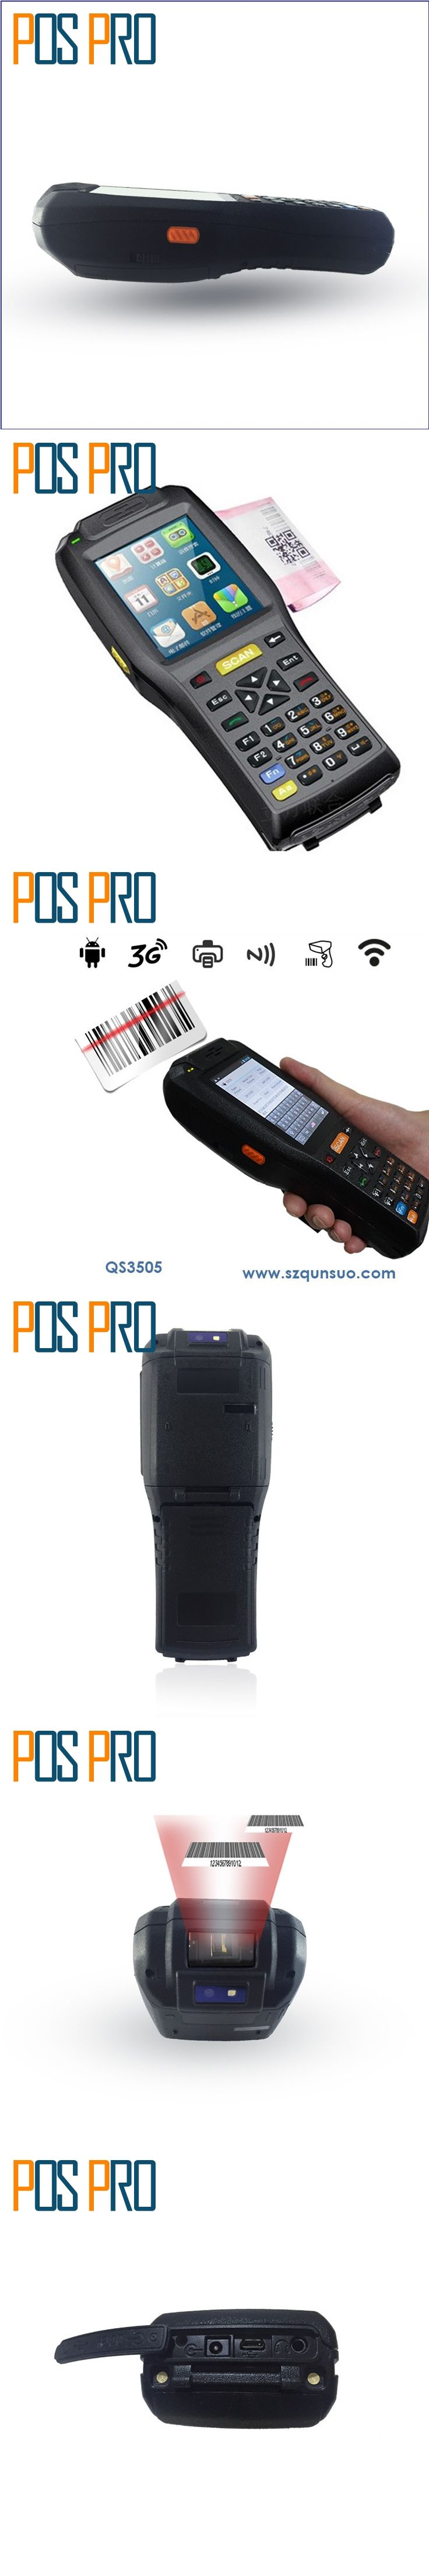 IPDA015 Android Portable Computer 58mm Thermal Printer 1D 2D QR Barcode Scanner handheld terminal GPS Fingerprint Card Reader